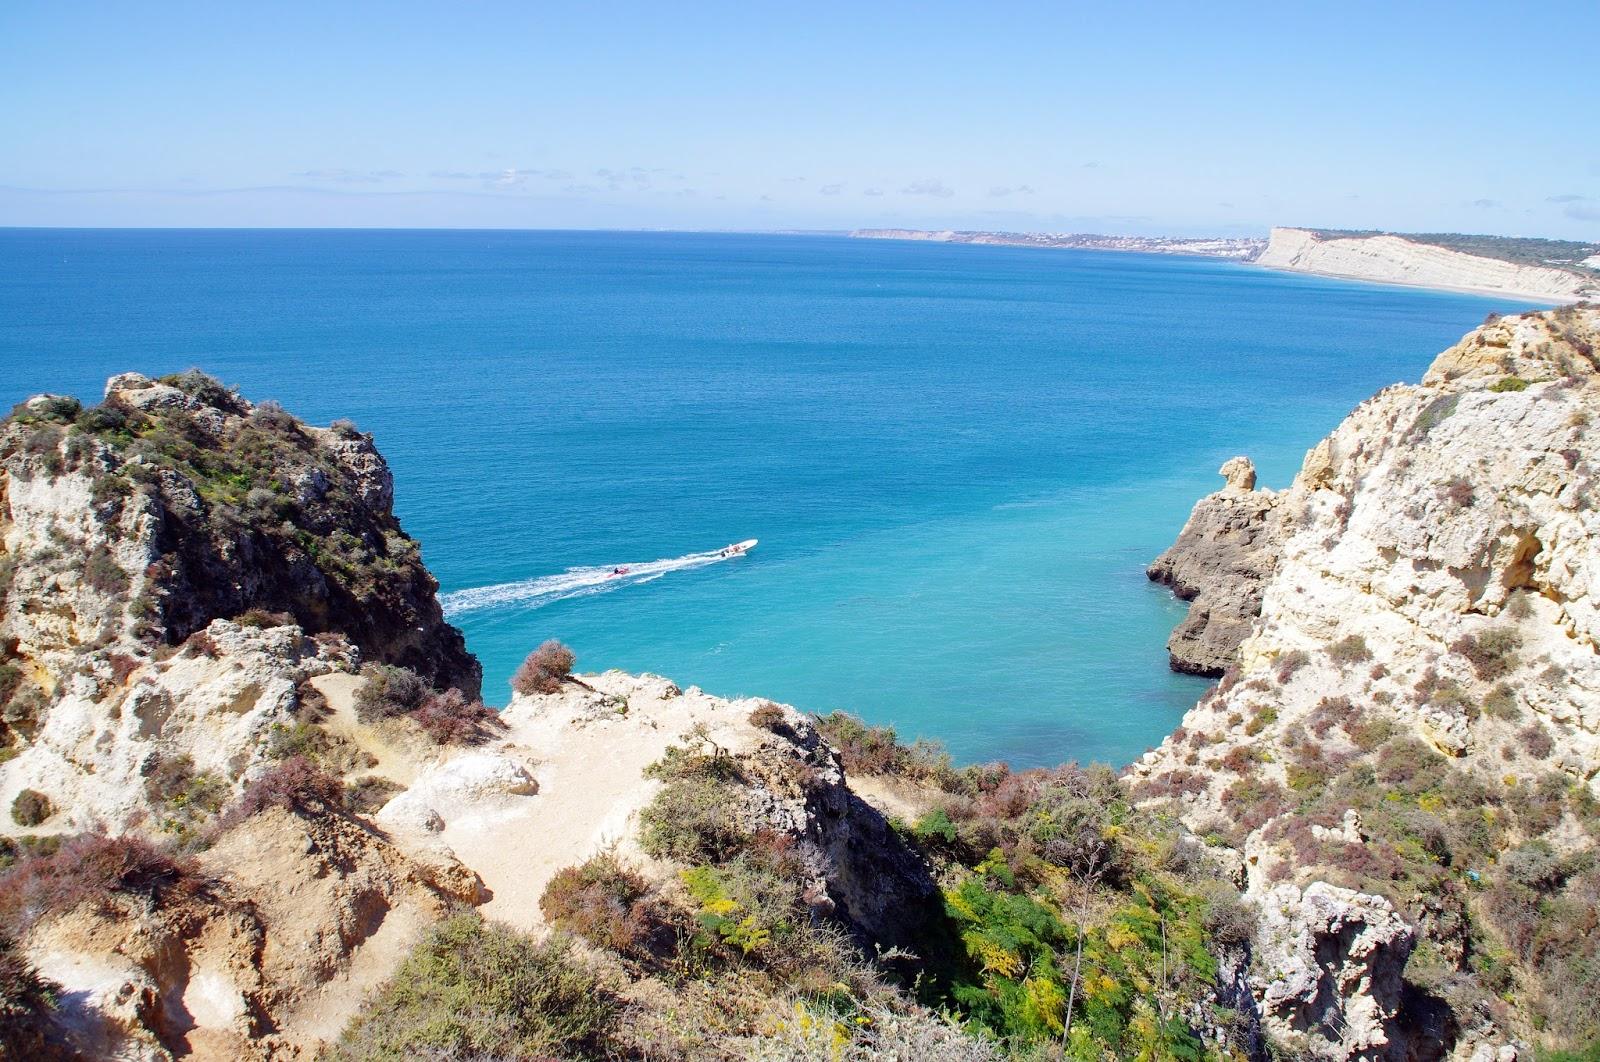 Beach in Lagos Algarve